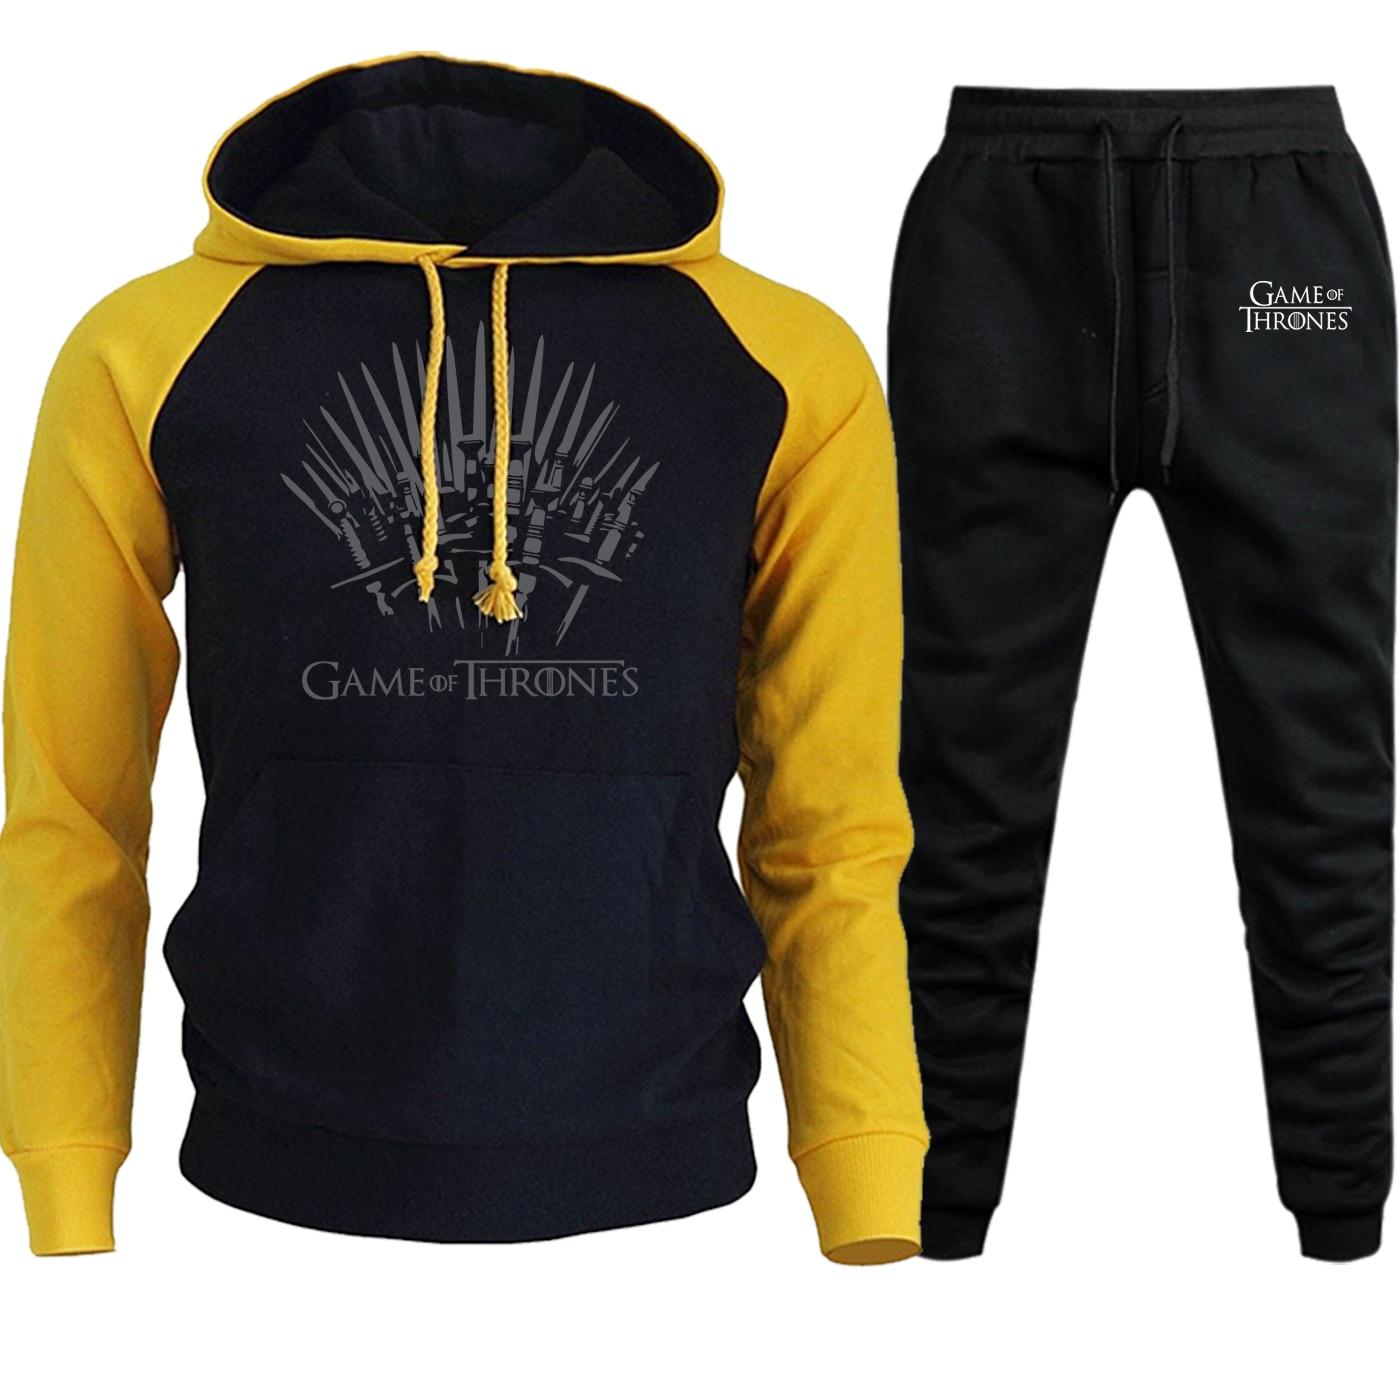 Vintage Print Hoodies Men Raglan Streetwear Autumn Winter 2019 Game Of Thrones Suit Male Hip Hop Fleece Hooded+Pants 2 Piece Set